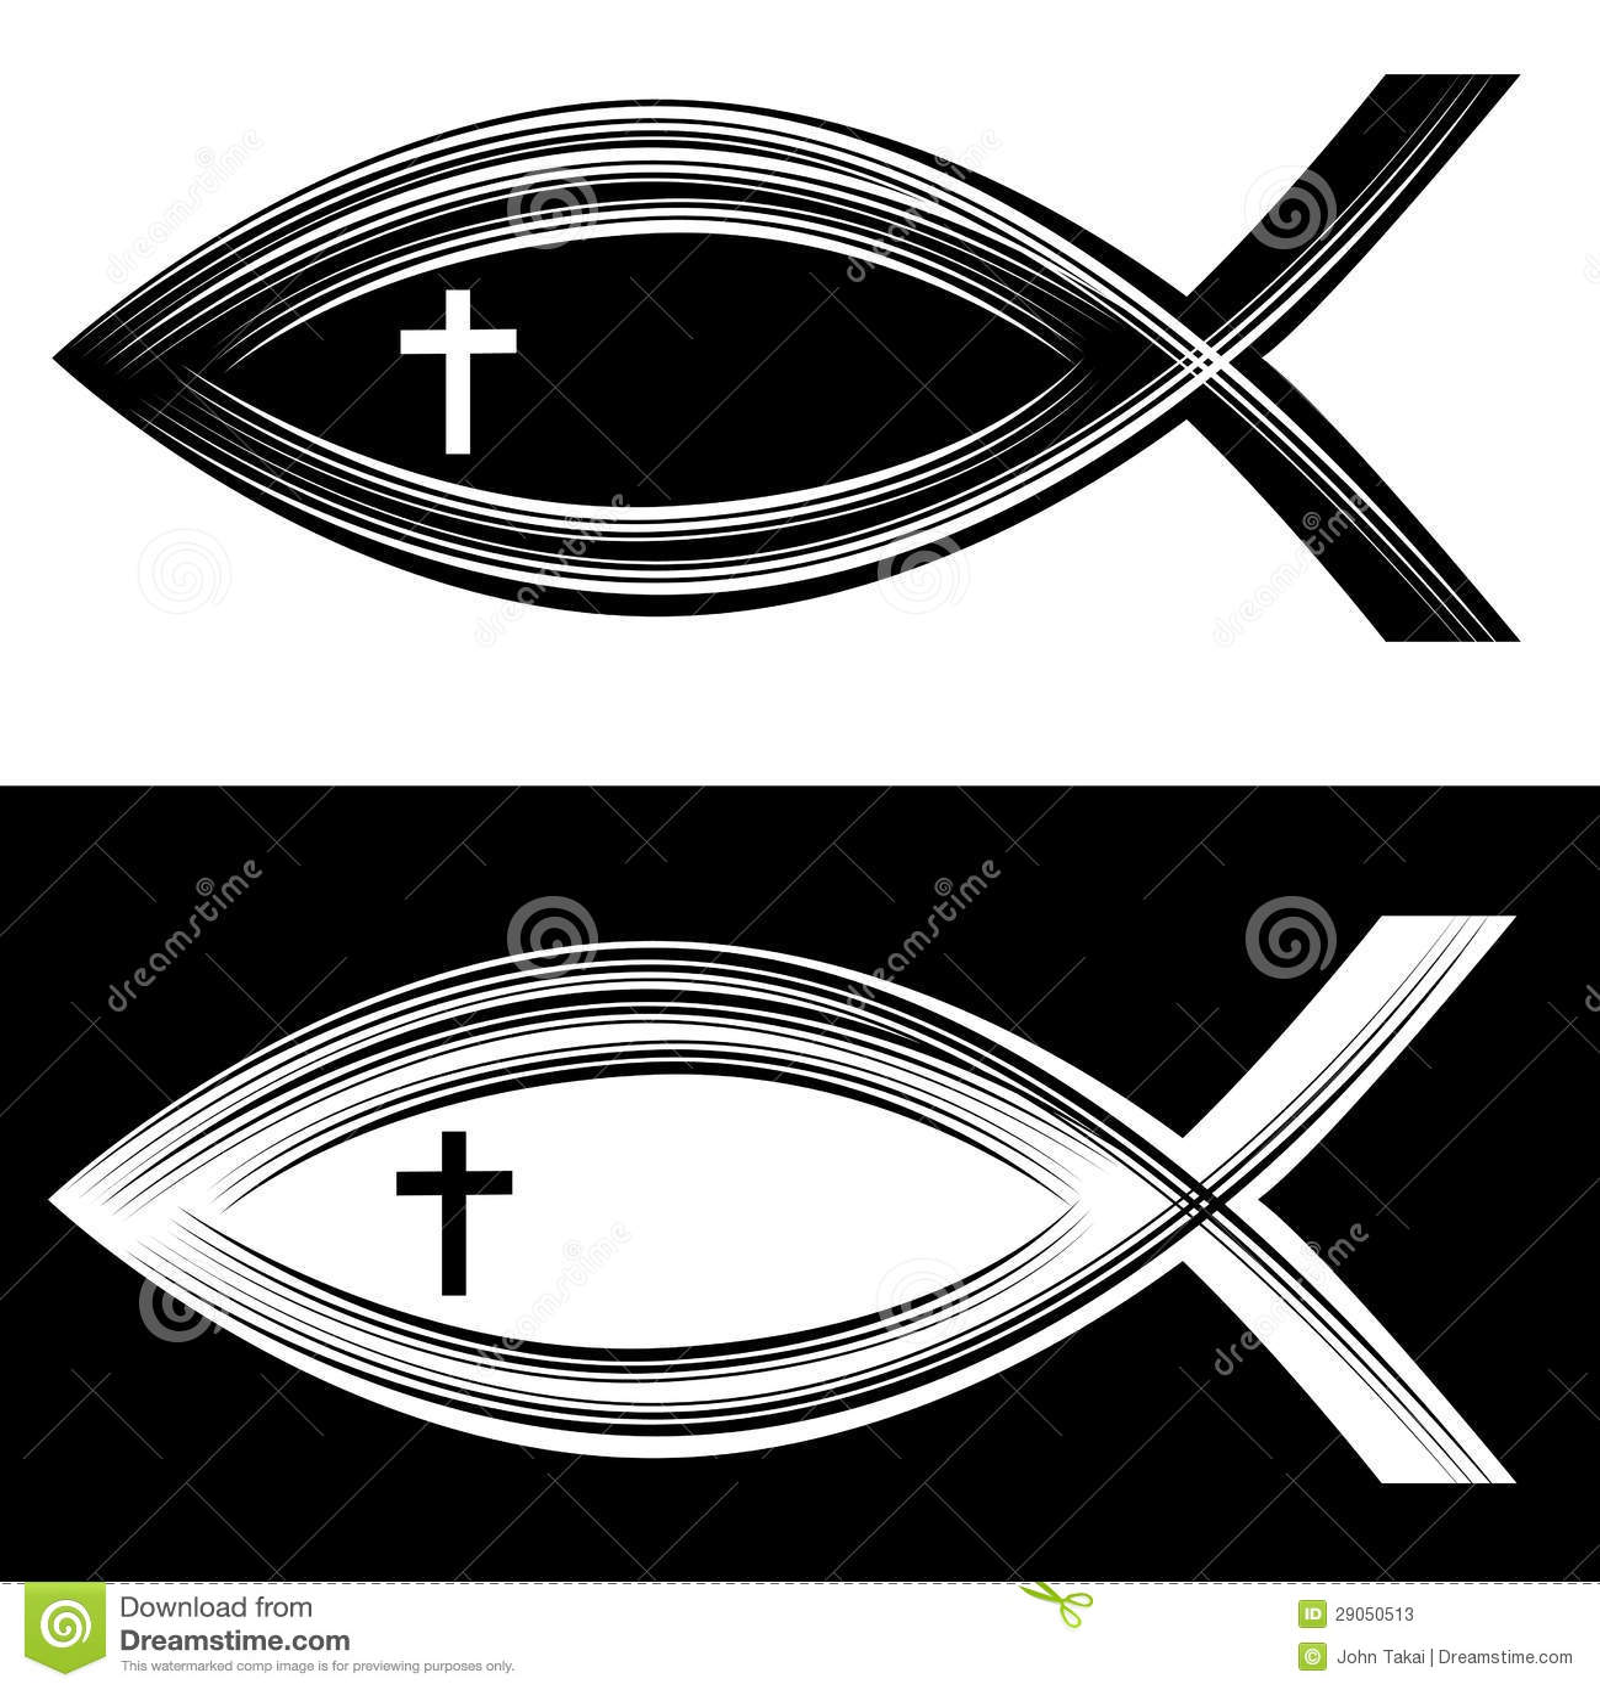 Scratchboard Christian Fish Stock Vector Illustration Of Element